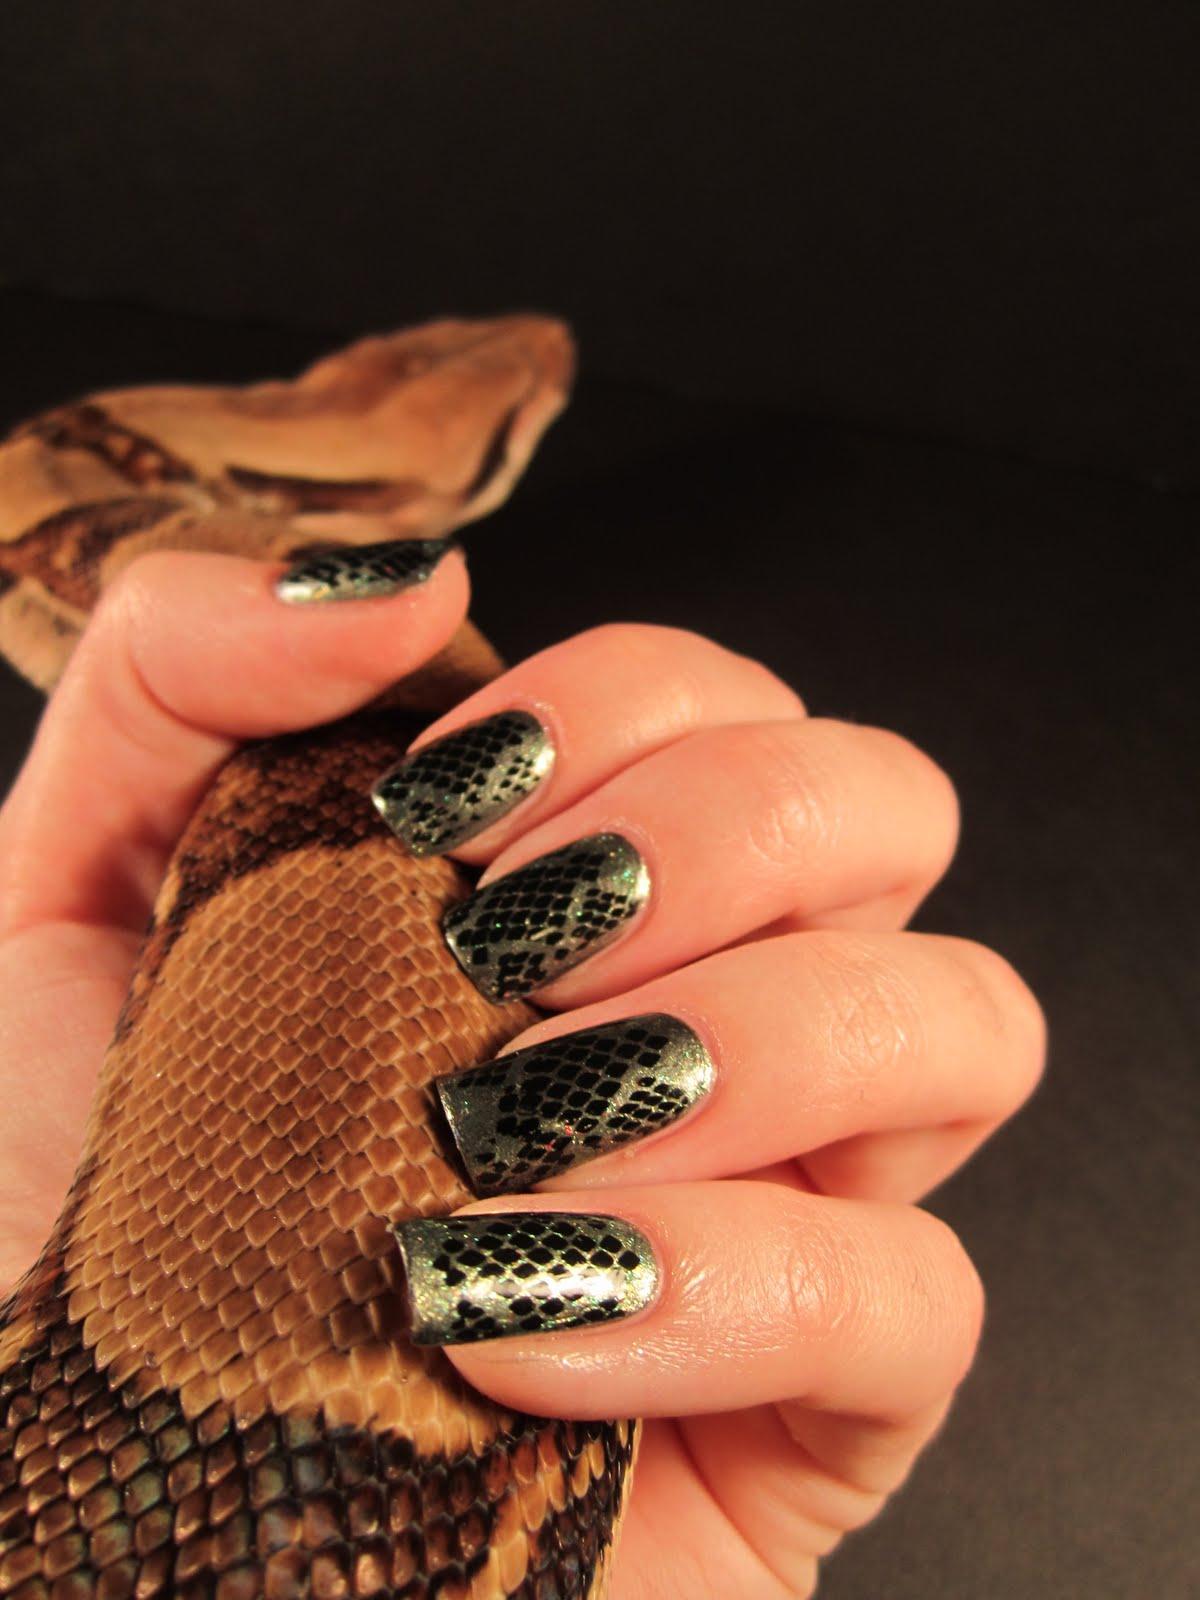 Эффект змеи на ногтях фото